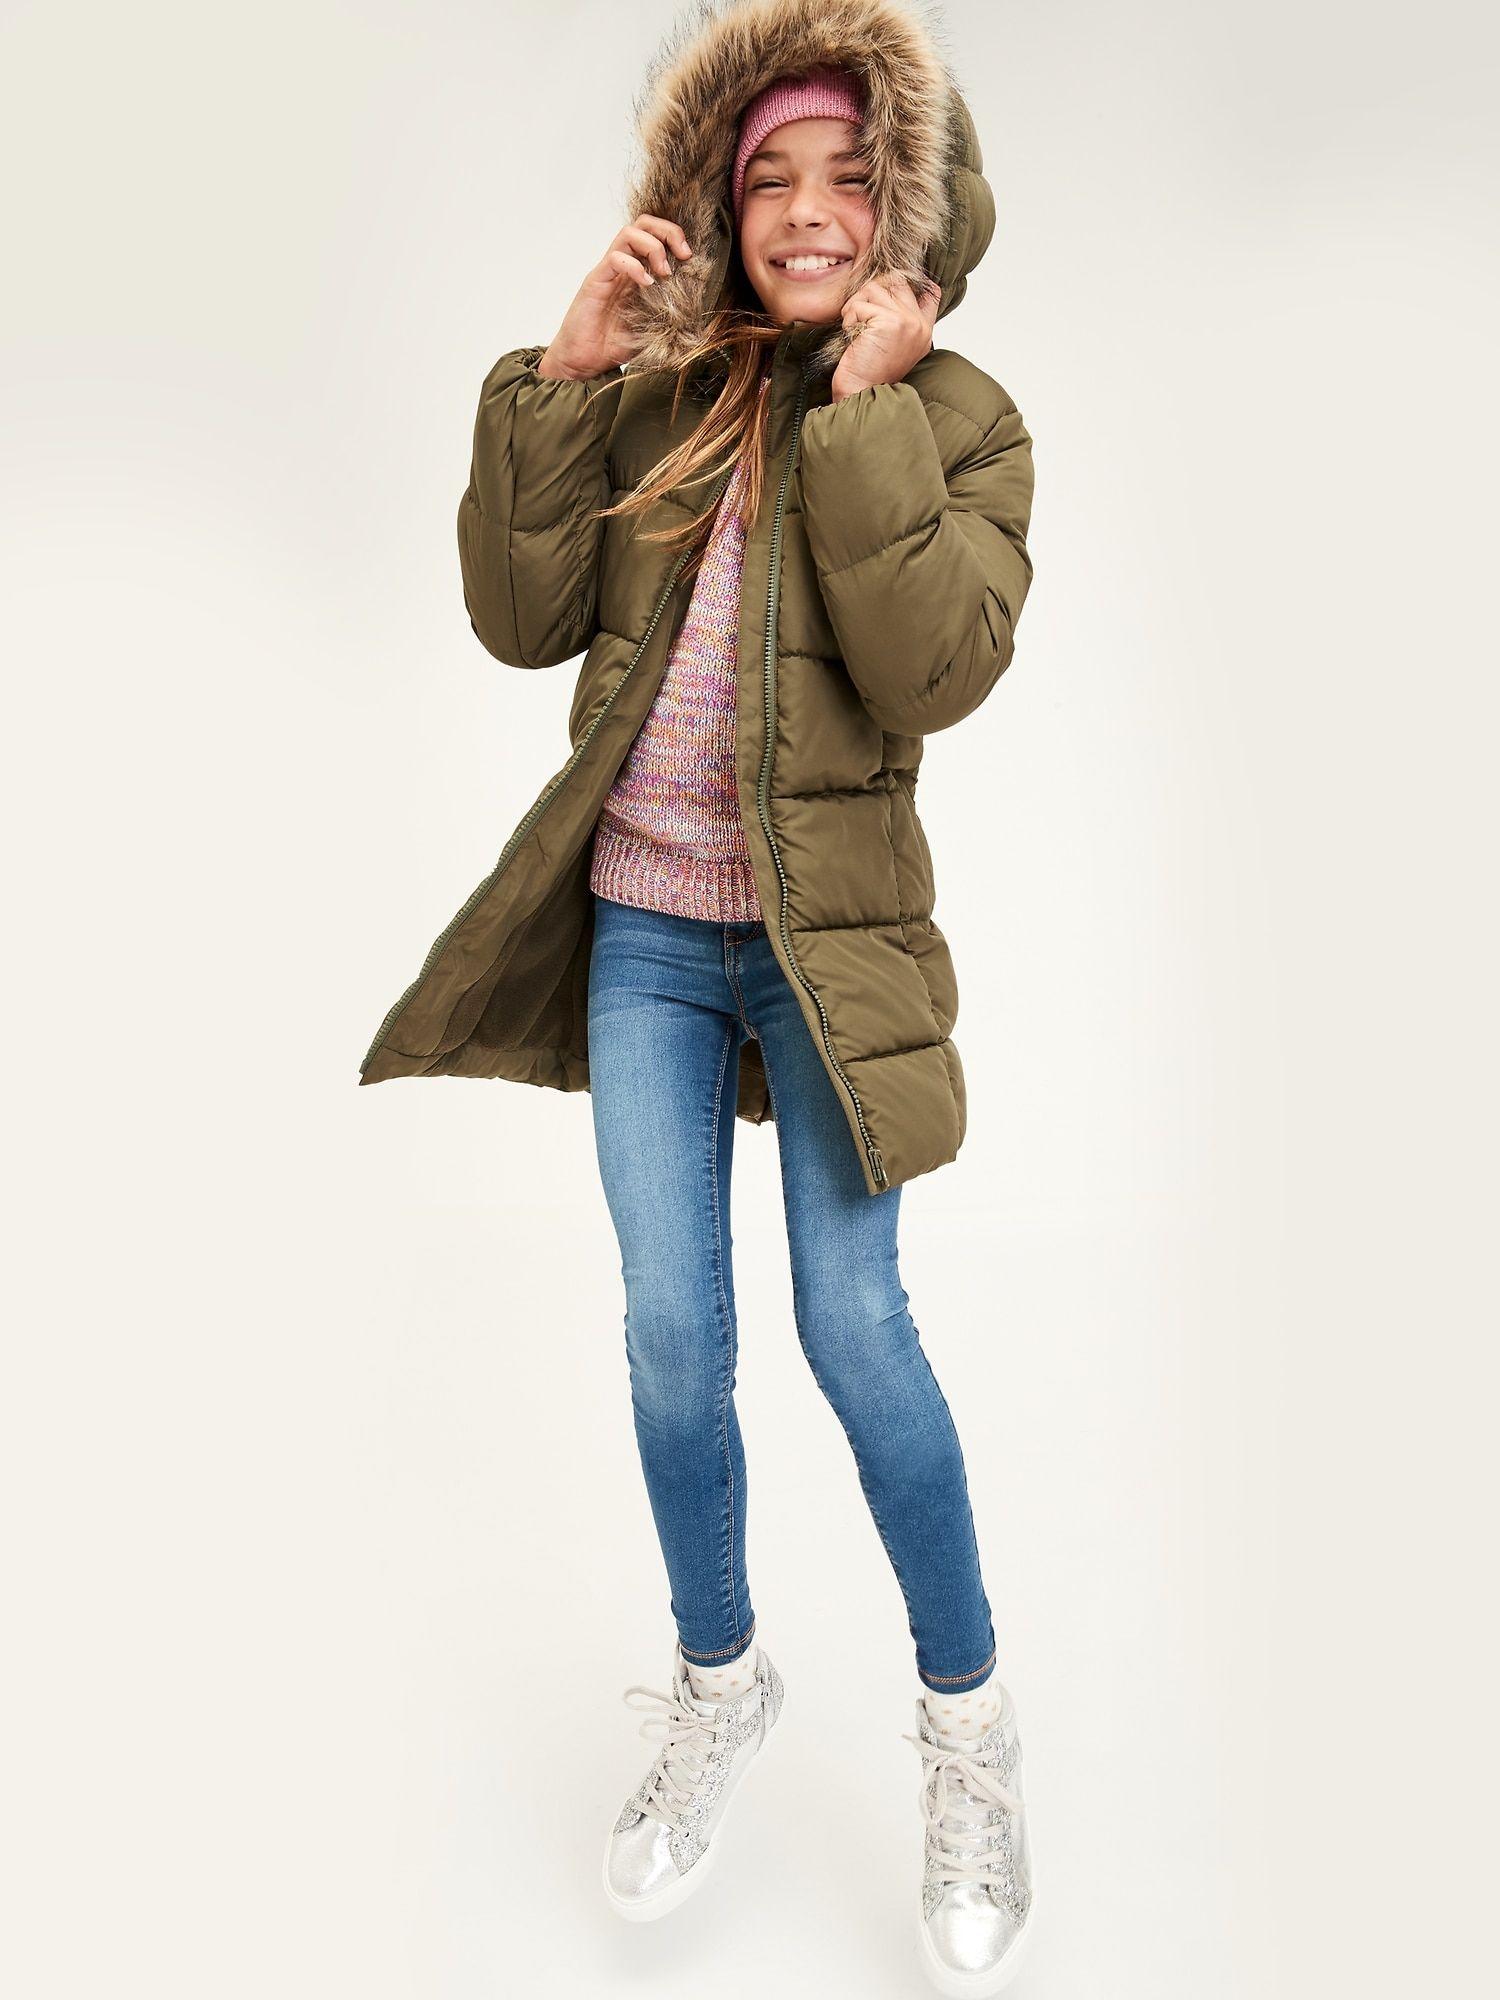 Kids Longline Hooded Puffer Jacket Gap Factory Denim Women Girls Shopping Fashion [ 2000 x 1500 Pixel ]